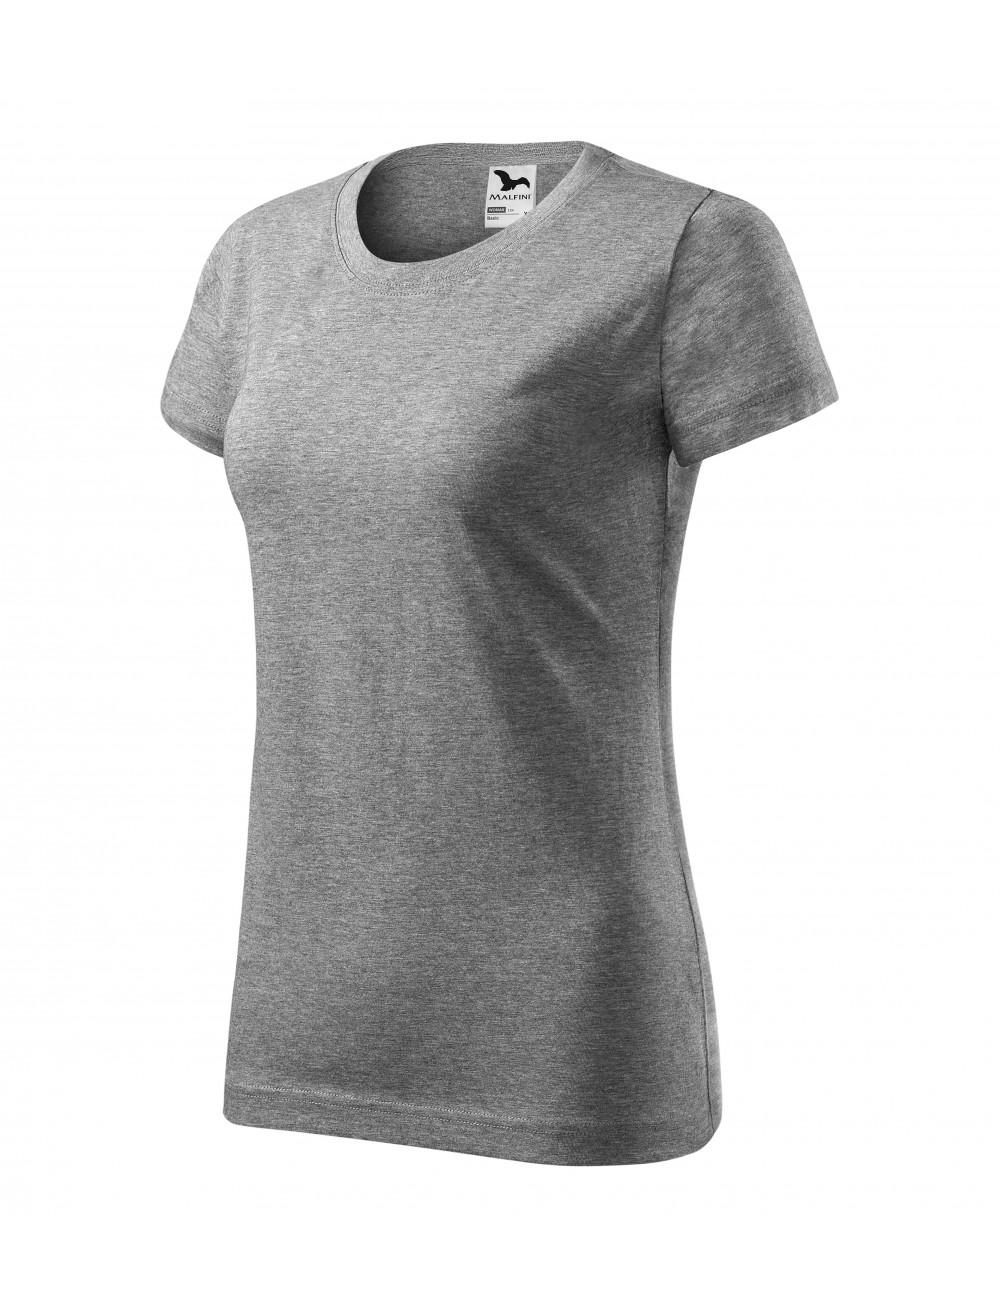 Adler MALFINI Koszulka damska Basic 134 ciemnoszary melanż